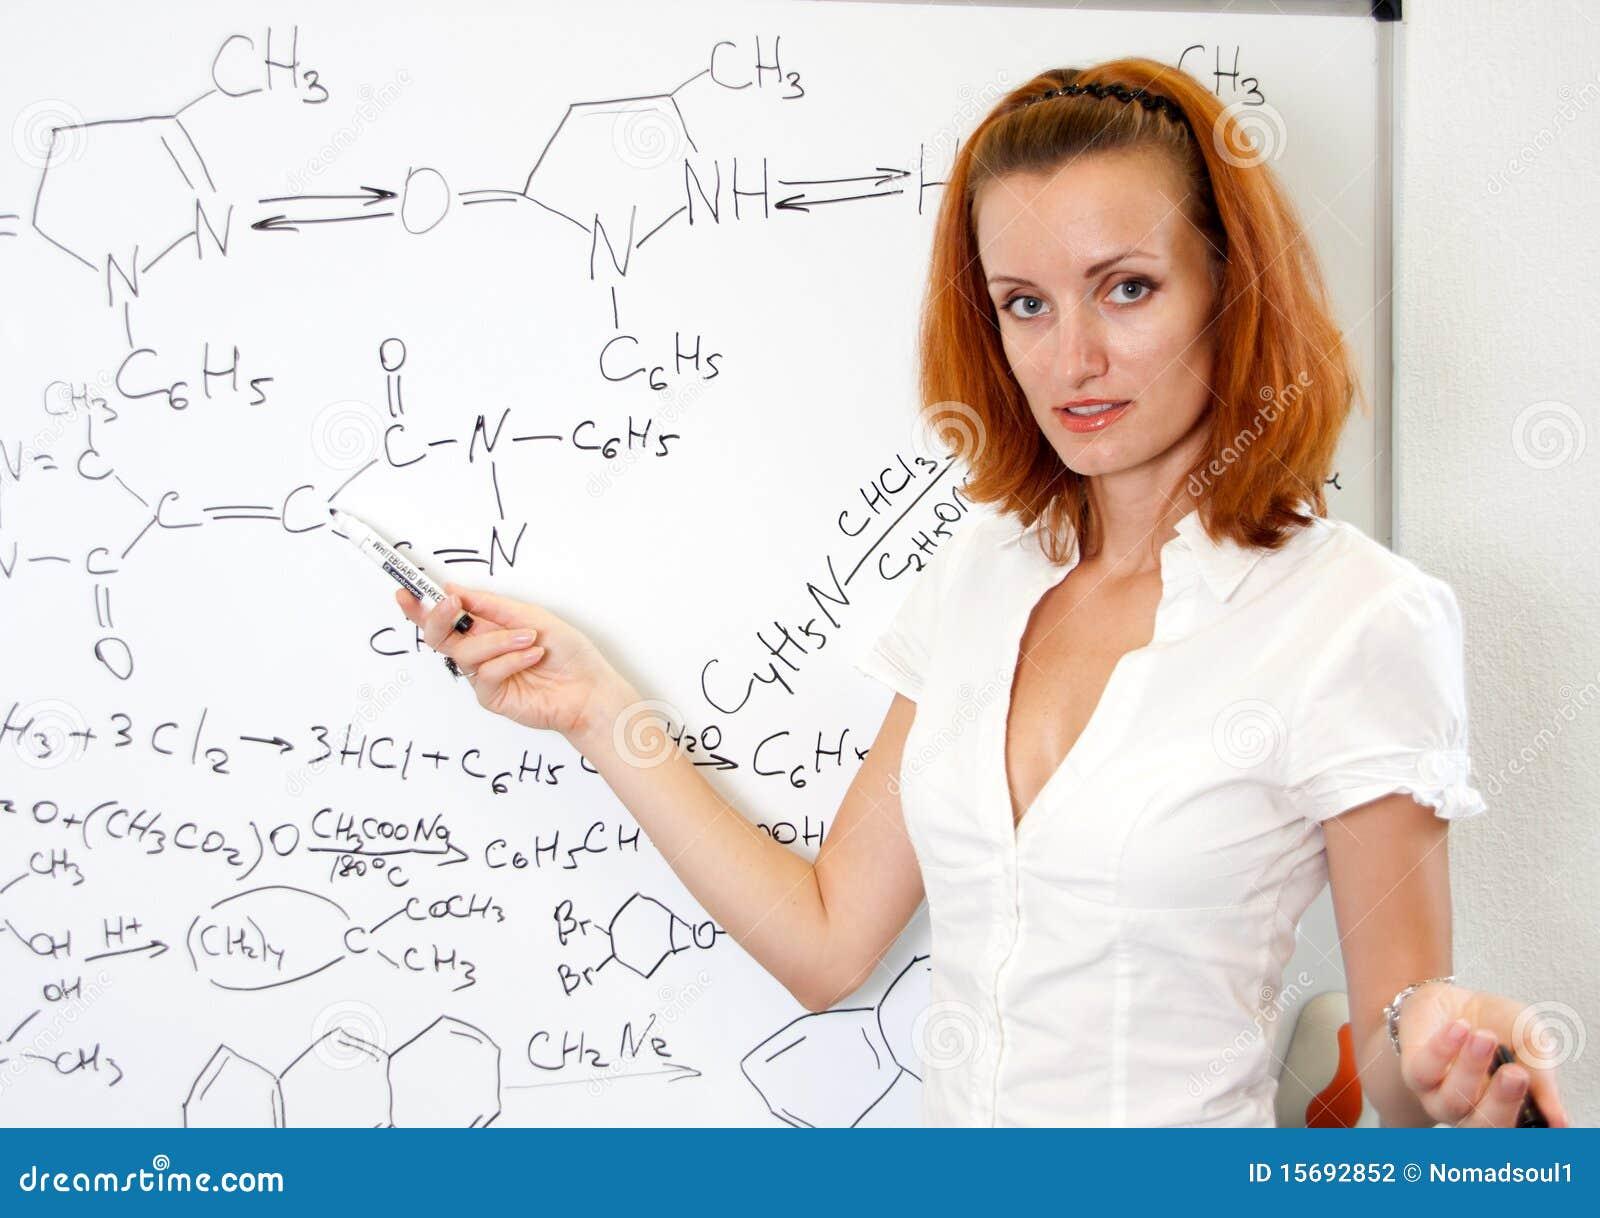 Chemistry Teacher Stock Photo Image Of Brainstorming - 15692852-9954